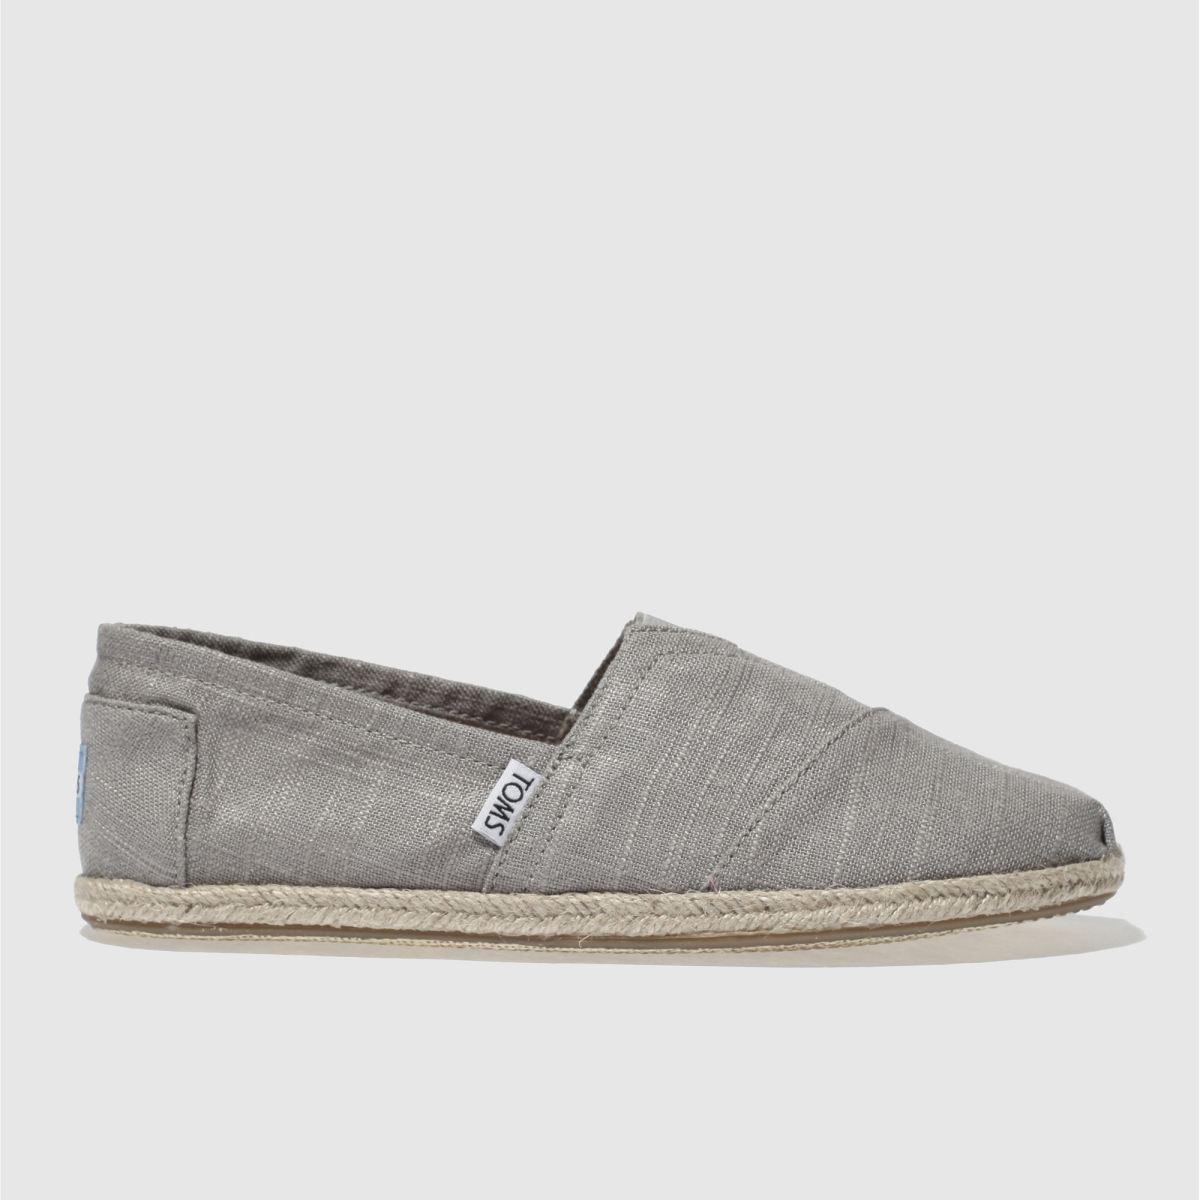 Toms Light Grey Classic Ii Shoes